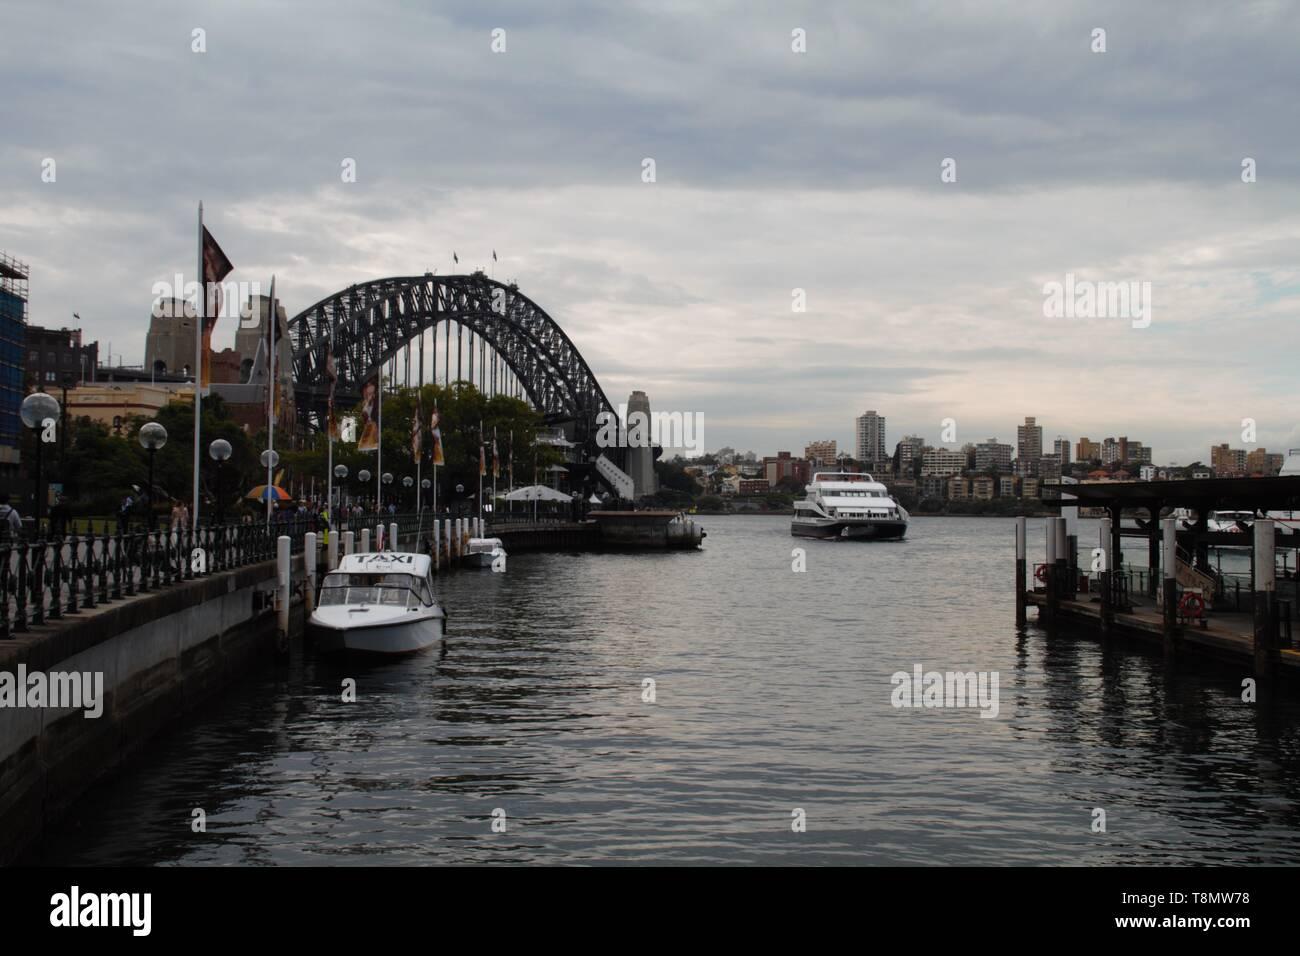 Panorama view of the Sydney harbour bridge - Stock Image